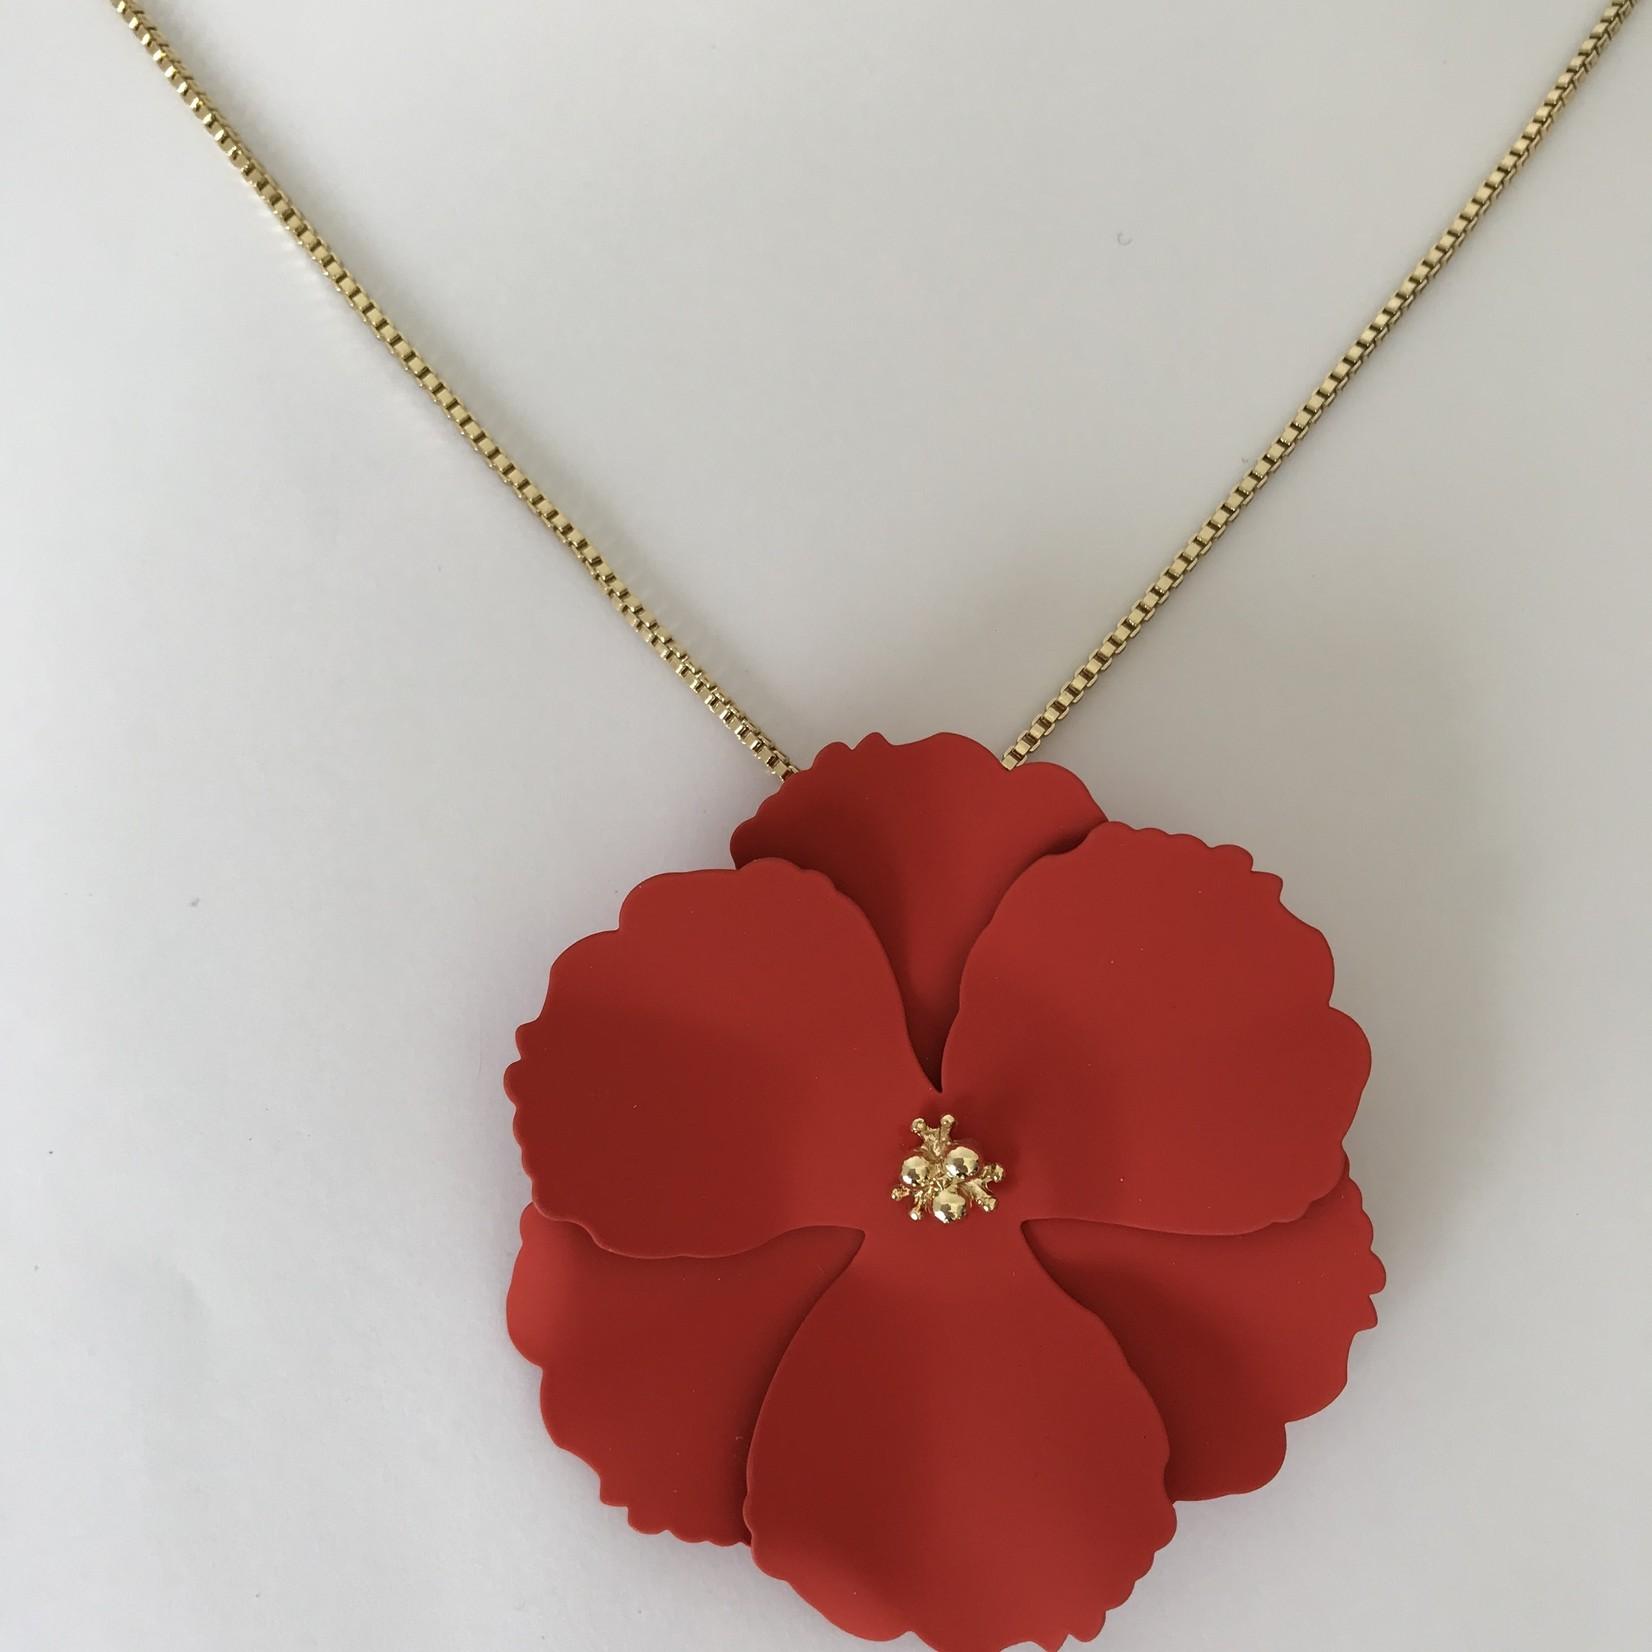 Axxes-Soir korte  goudkleurige  ketting met rode bloem